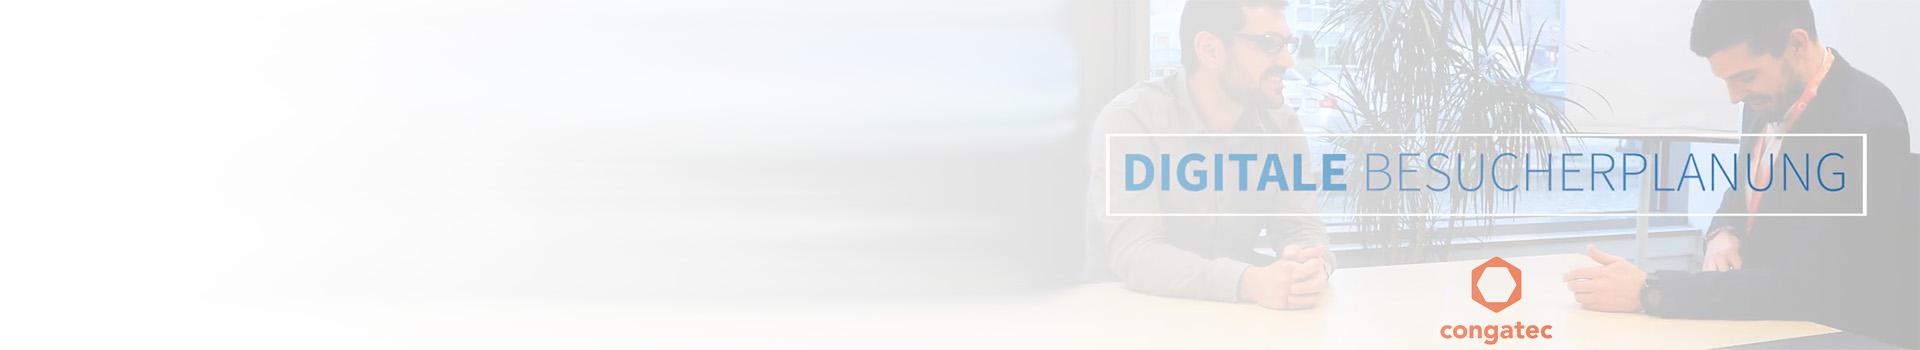 congatec Digitale BesucherPlanung Banner